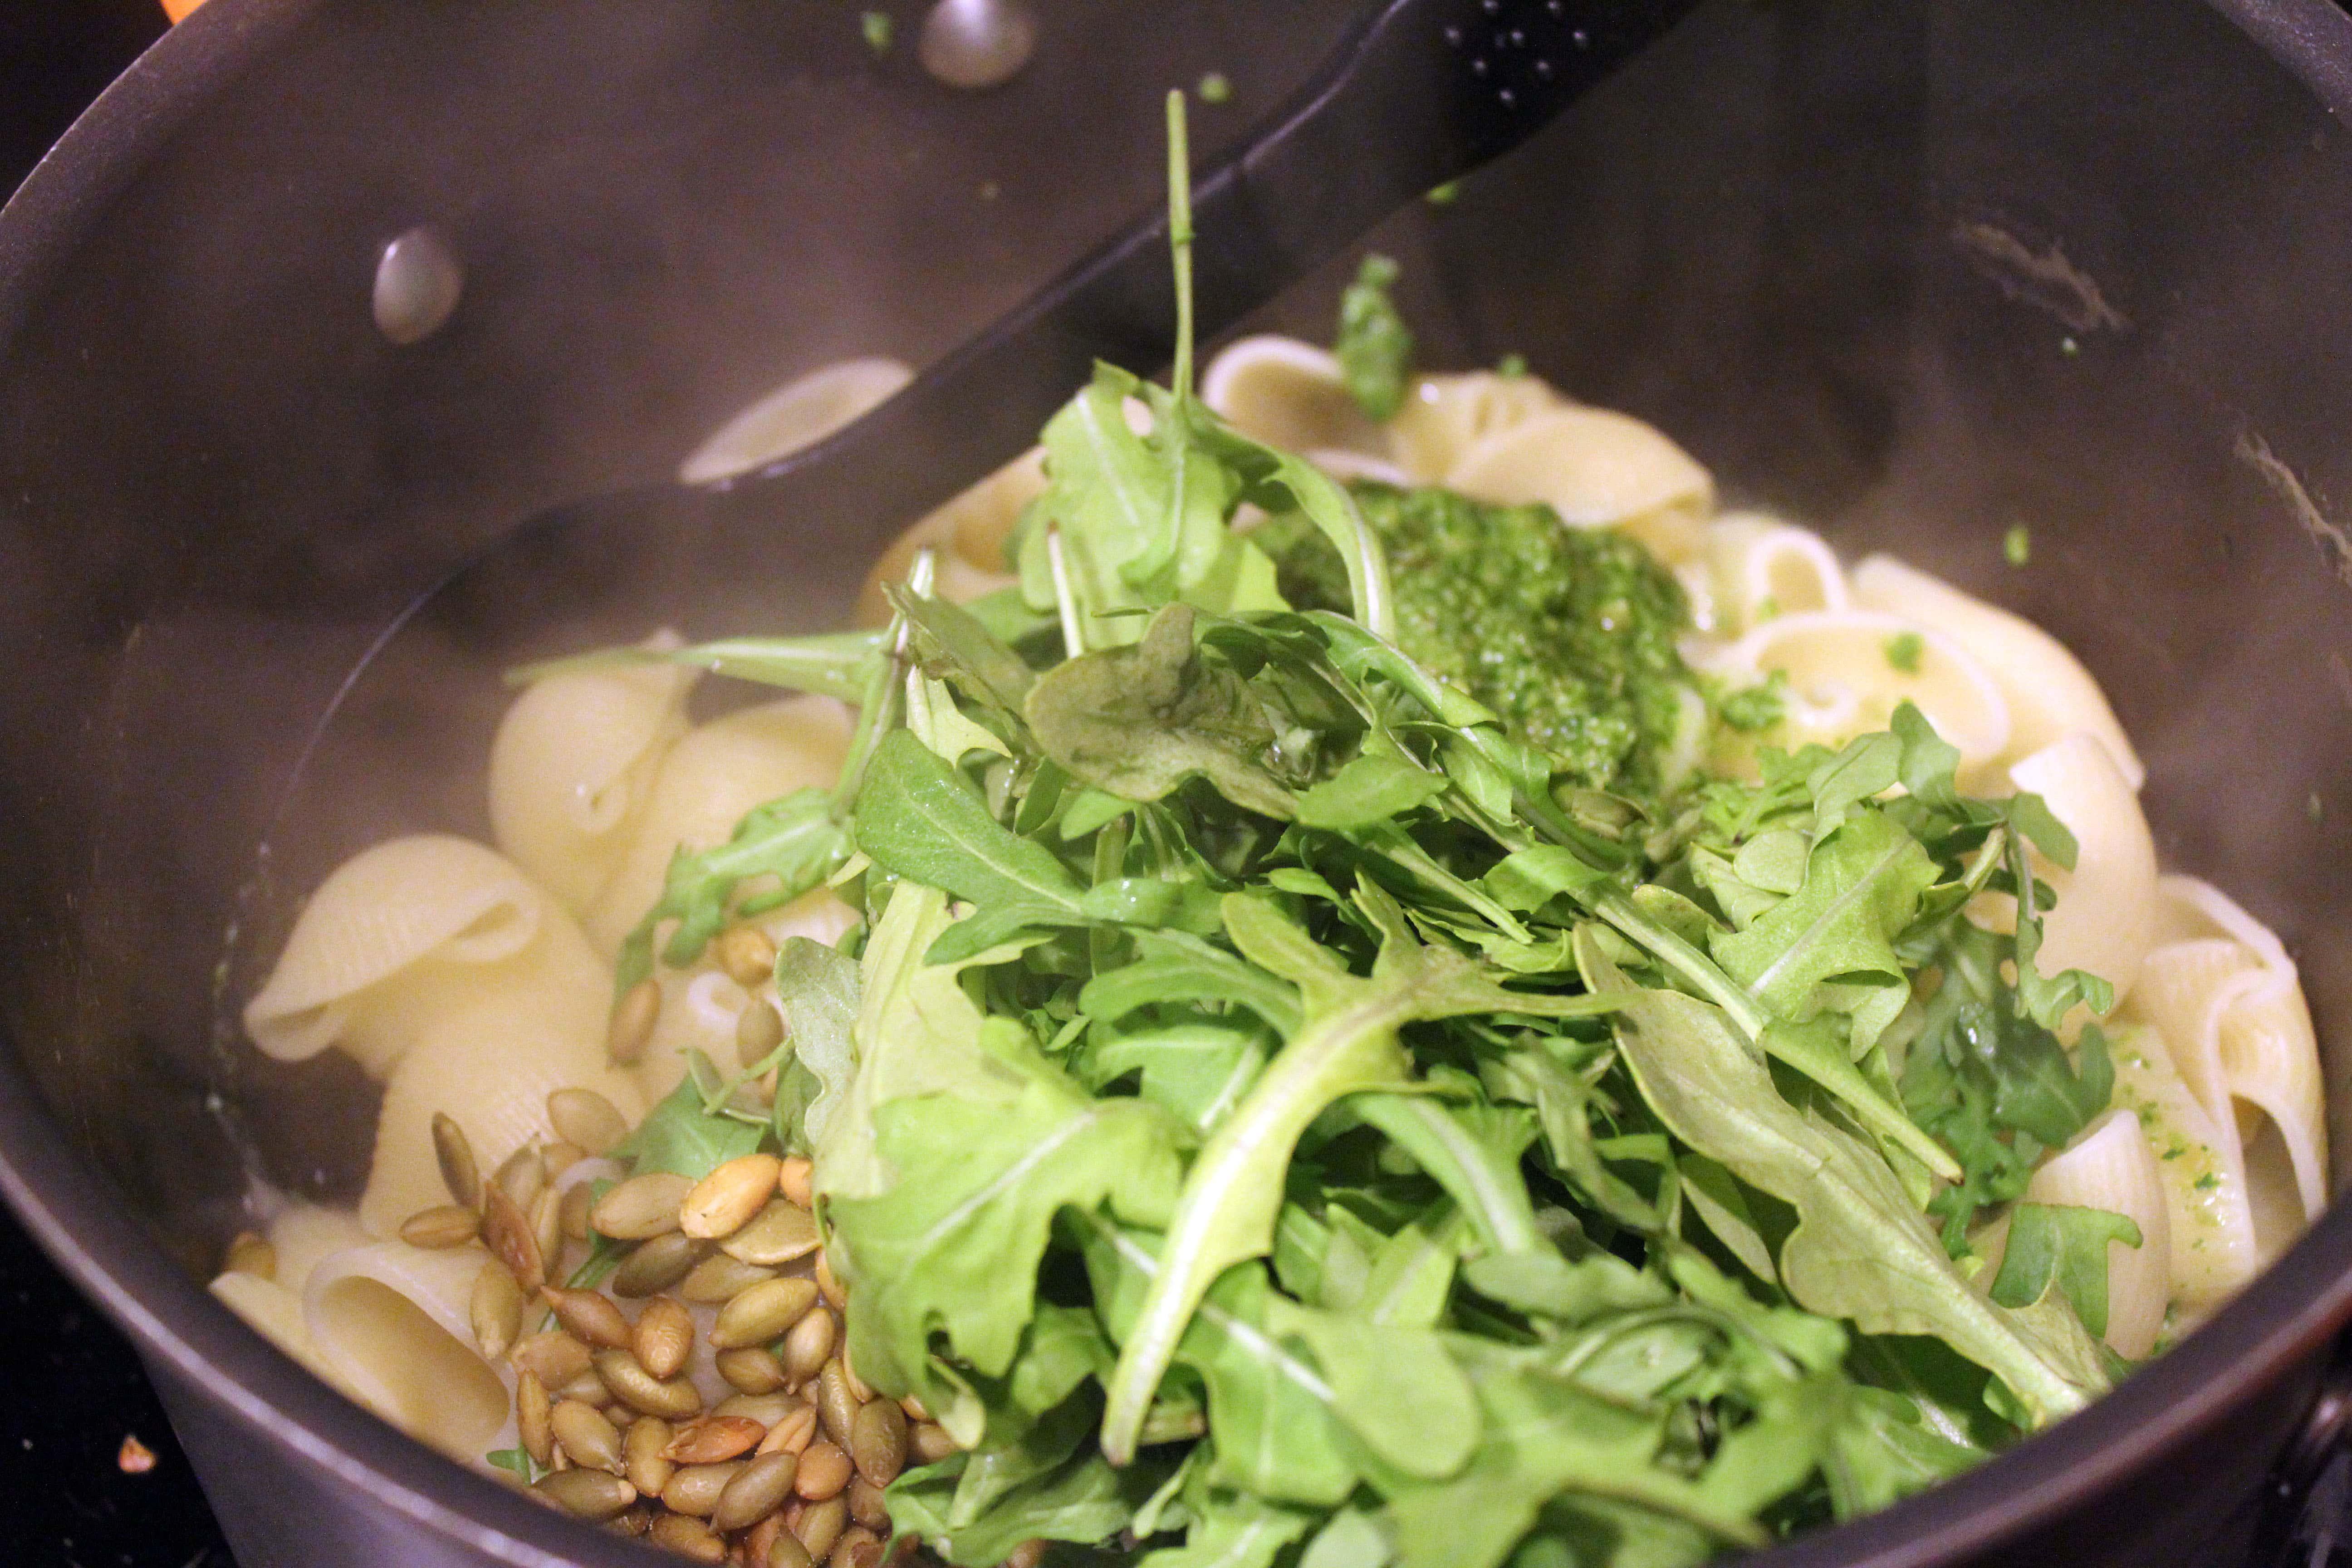 Add arugula and extra pepitas to pasta